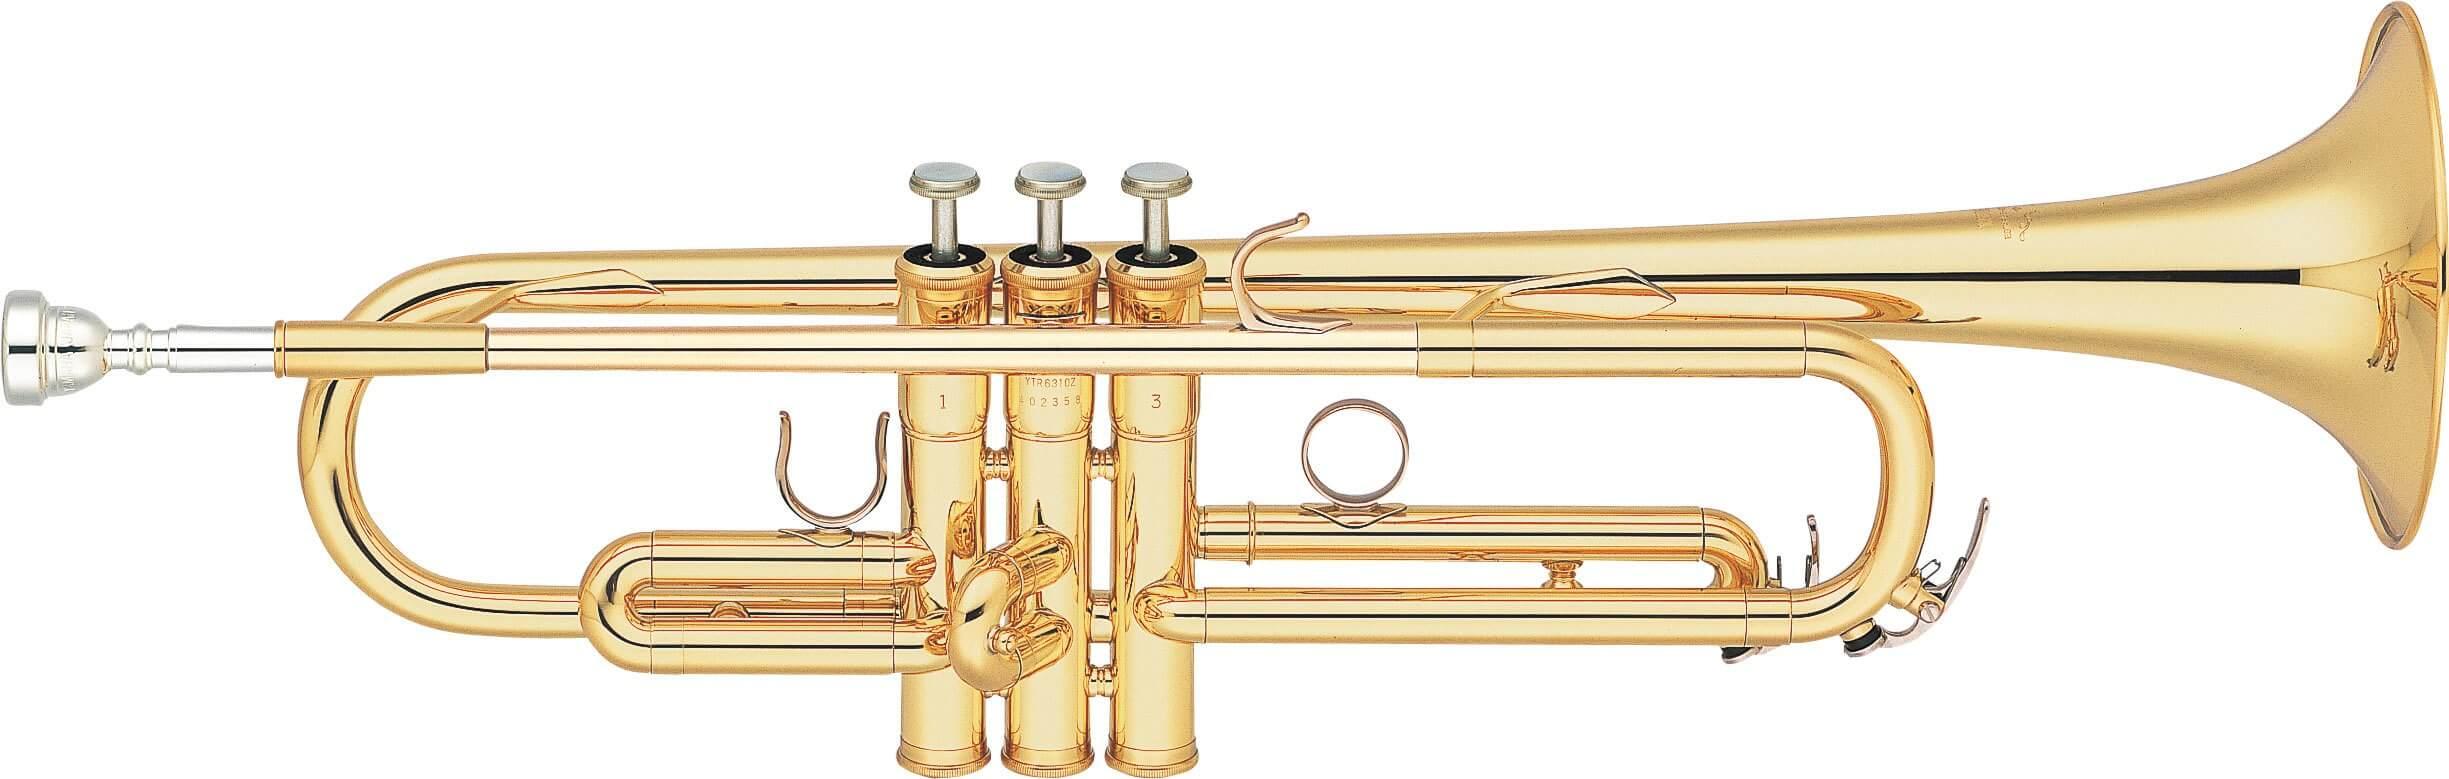 Trompeta Yamaha Ytr 6310Z Lacada